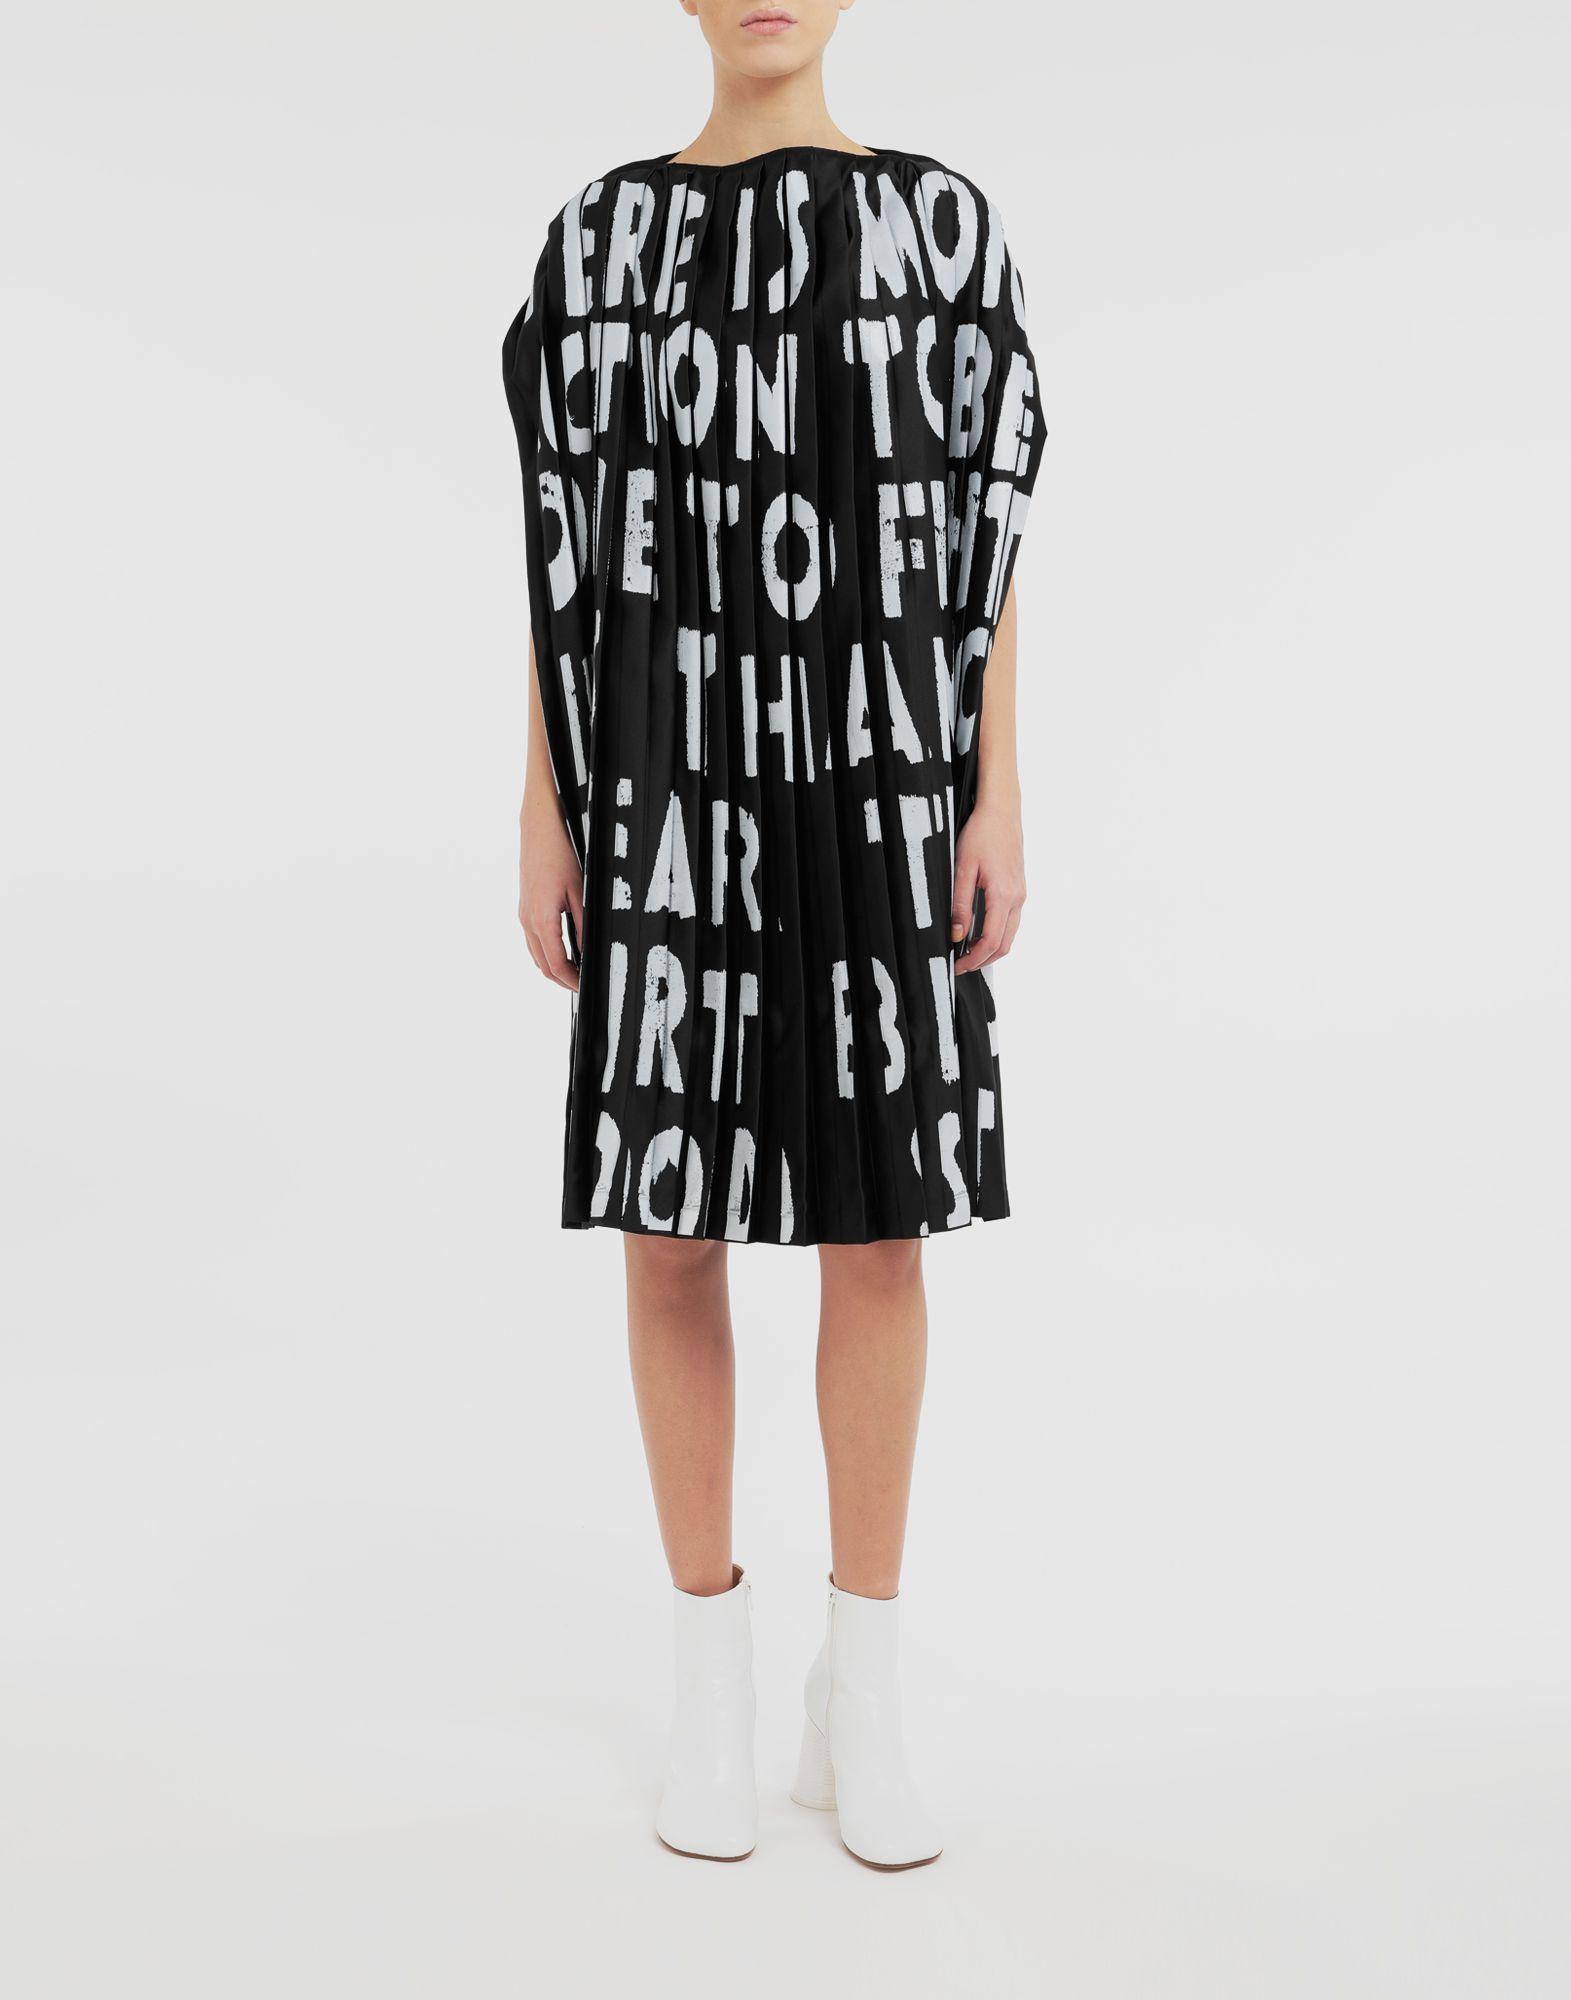 MM6 MAISON MARGIELA AIDS Charity pleated dress Short dress Woman r